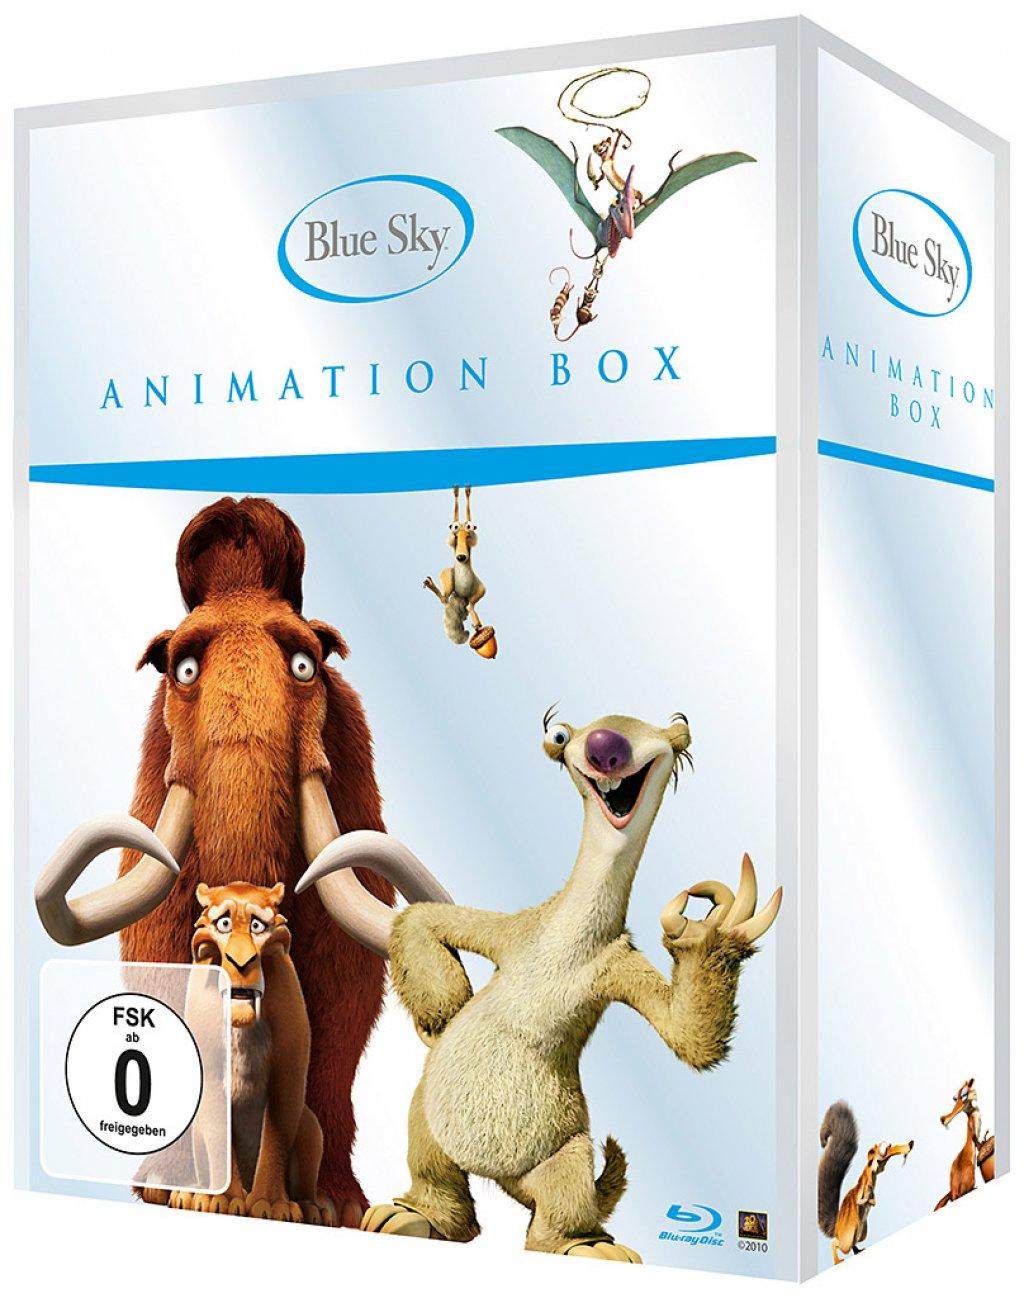 Blue Sky Animation Box (Blu-ray)